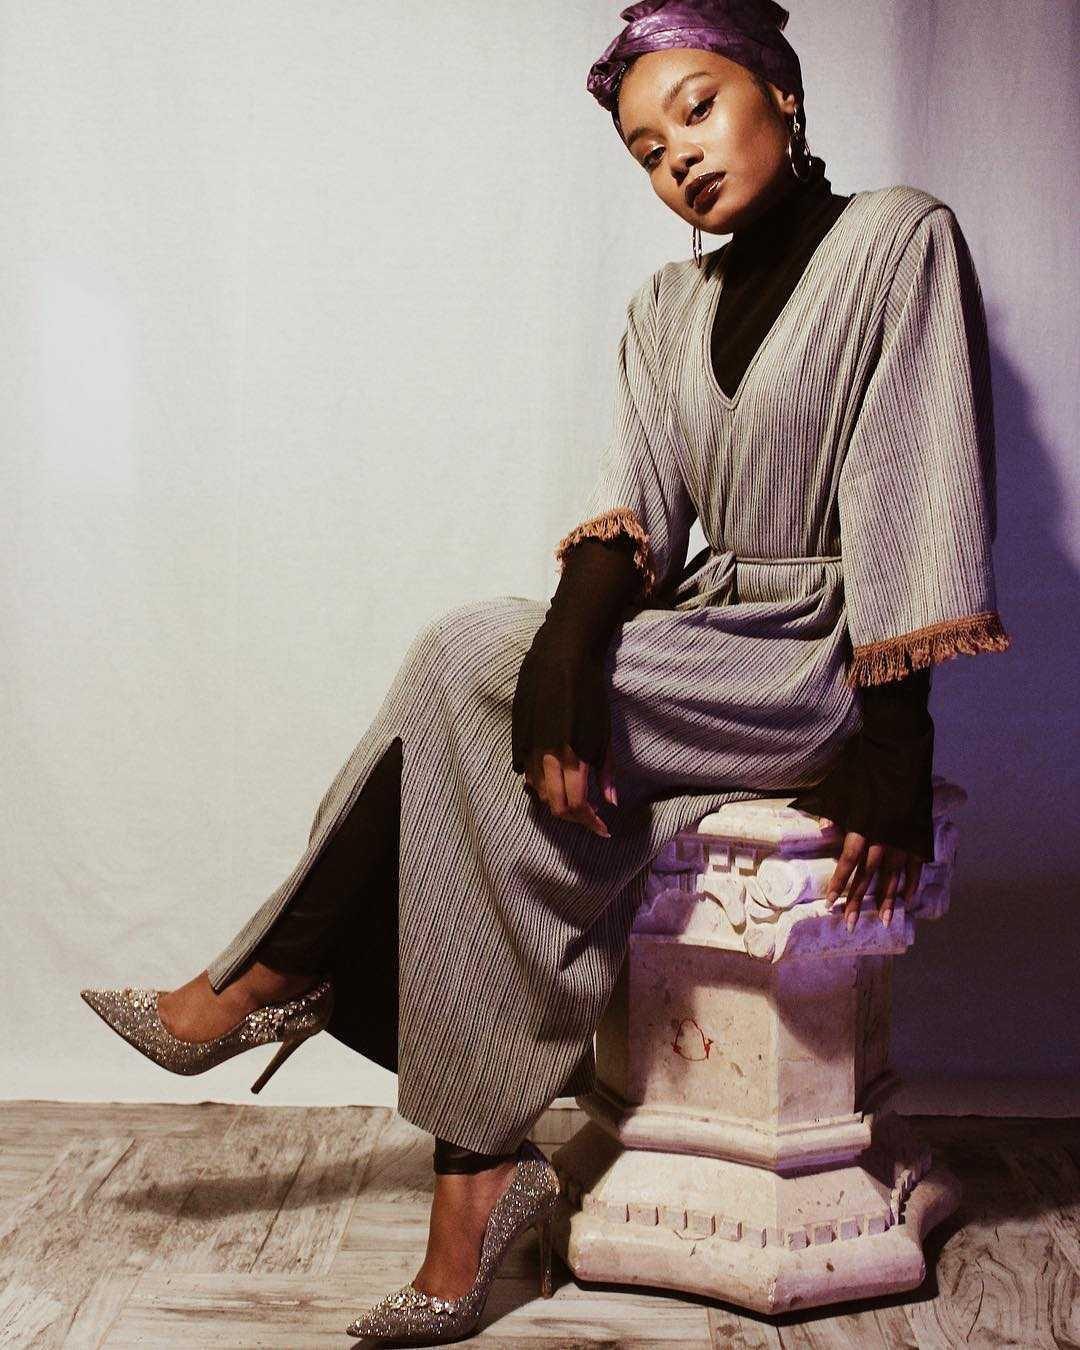 Muslimah style kazaya is the epitome of retro fashion koko tv nigeria Retro style fashion for muslimah